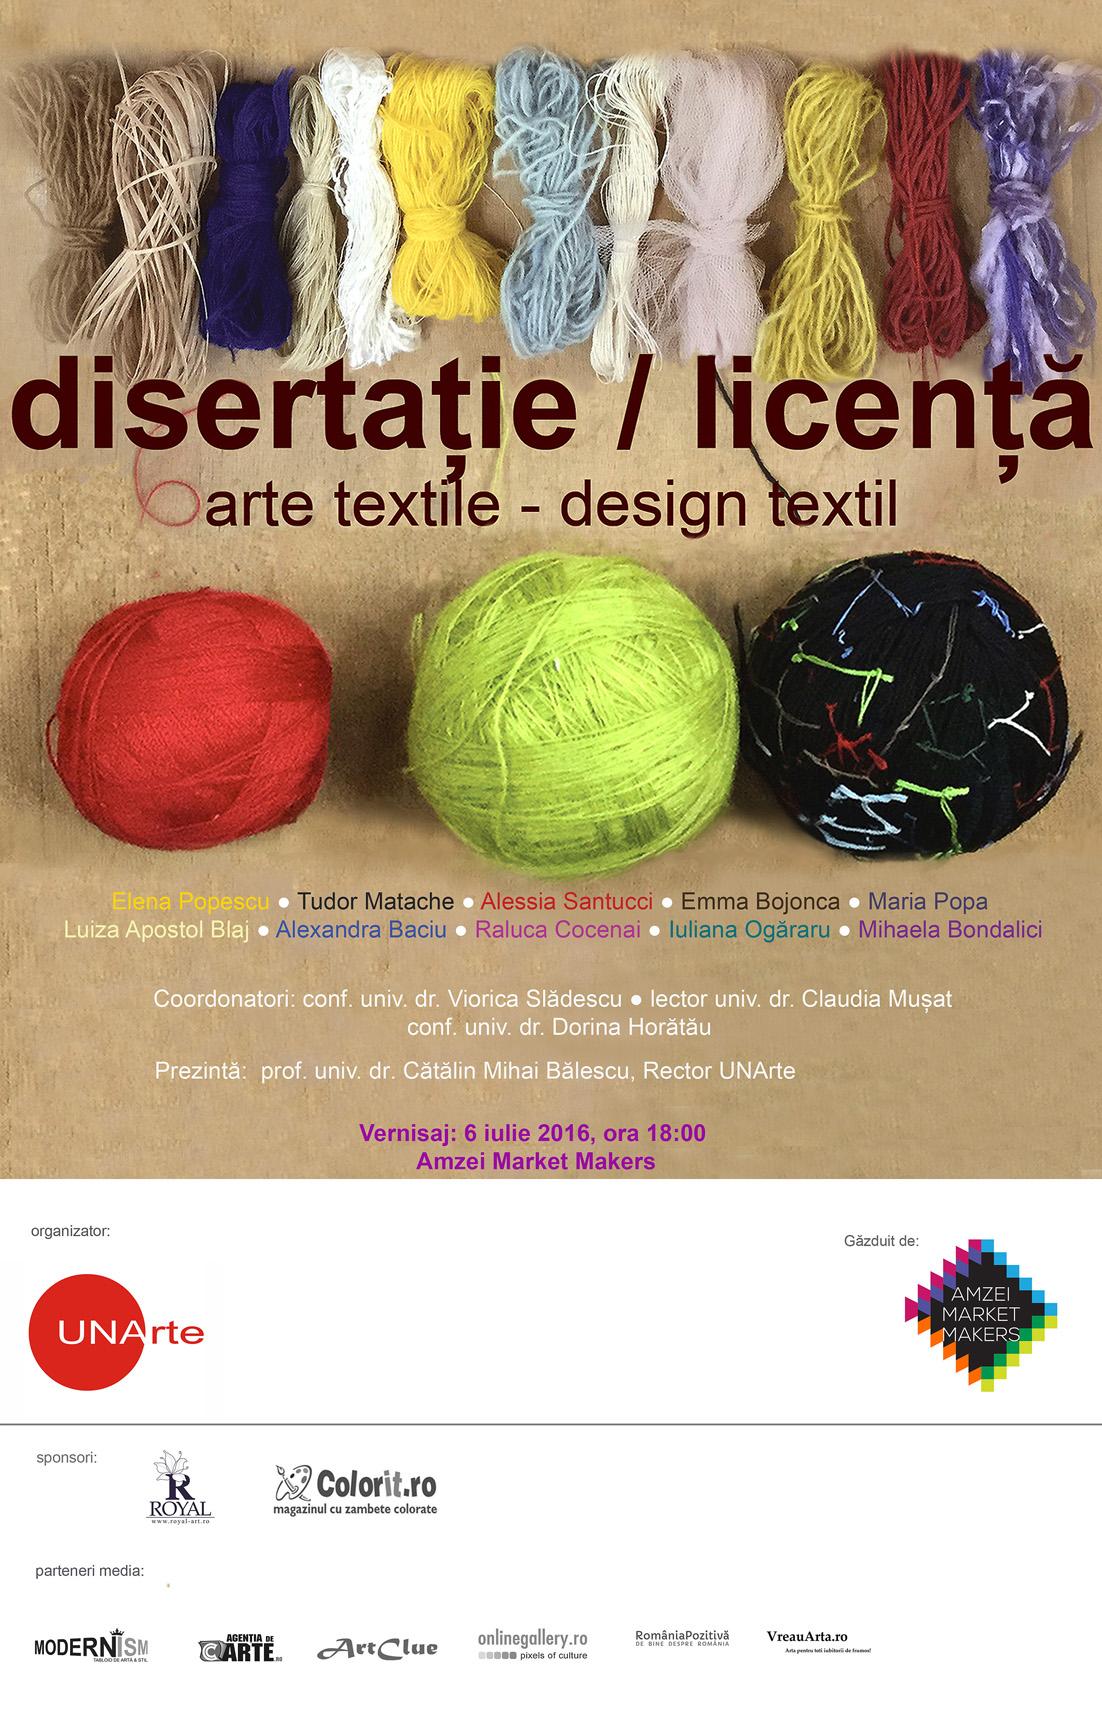 e_mail_Afis_Disertatie_Licenta_2016_AT-DT